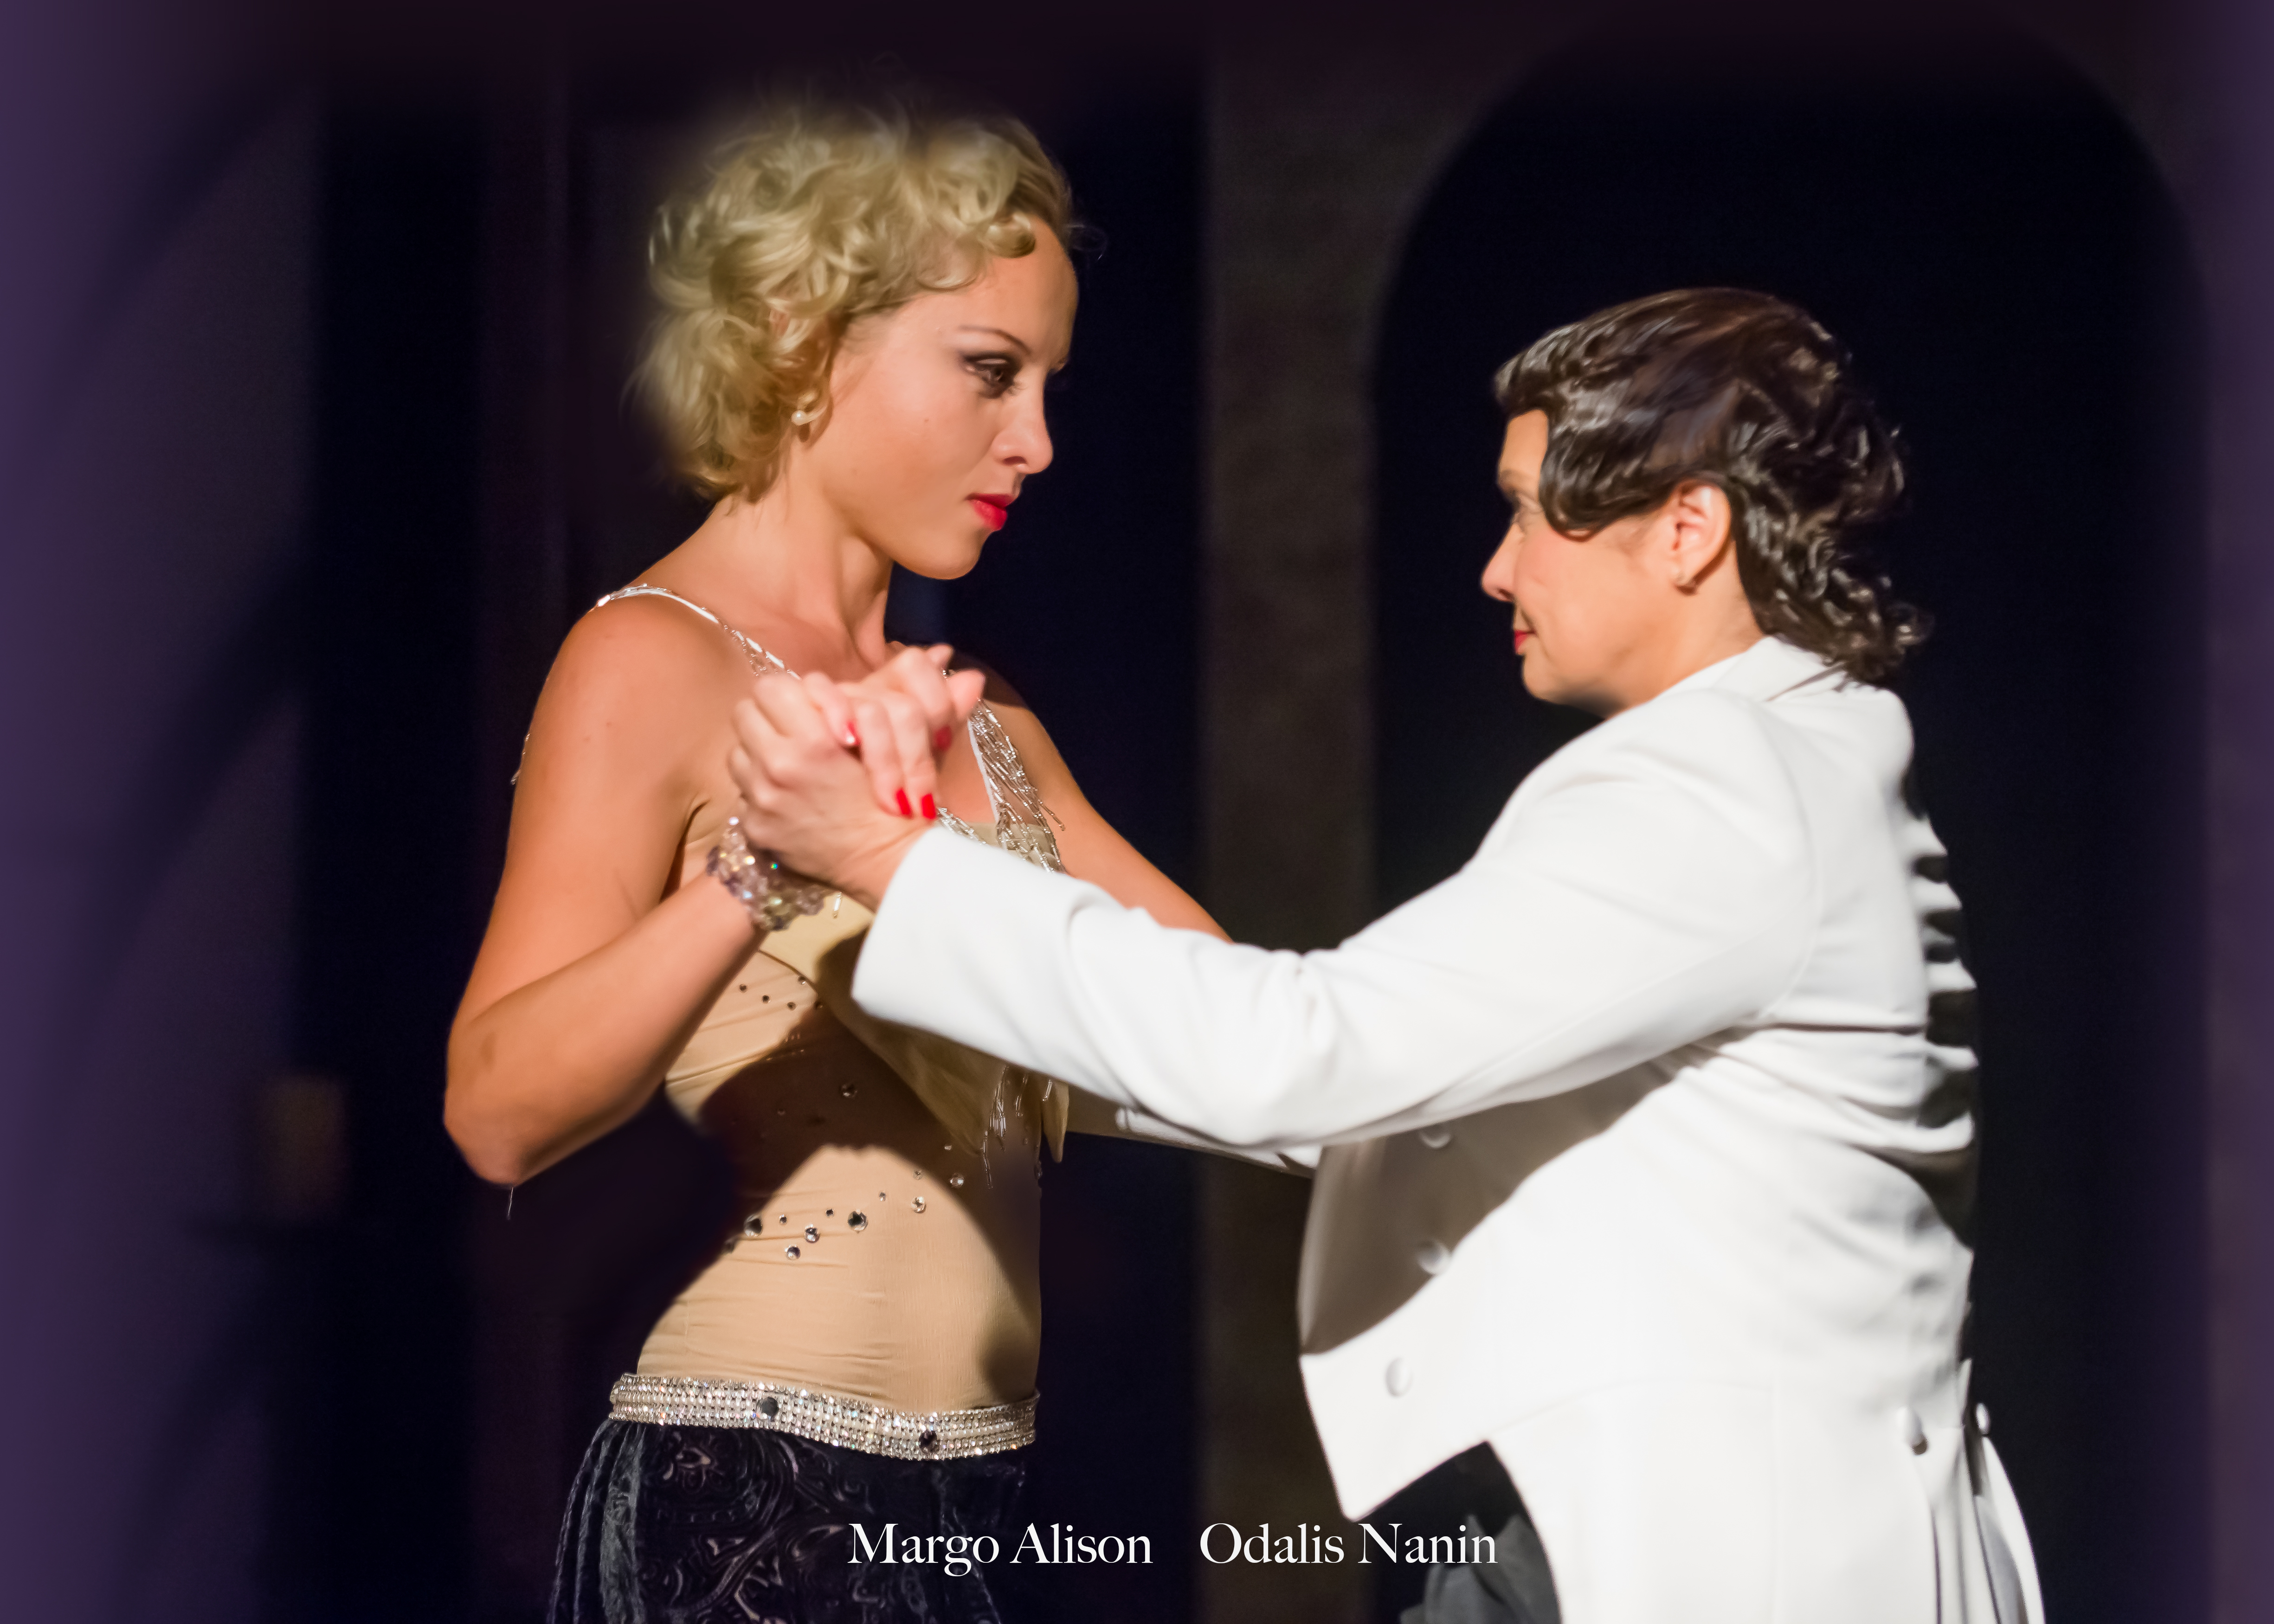 as Marlene Dietrich